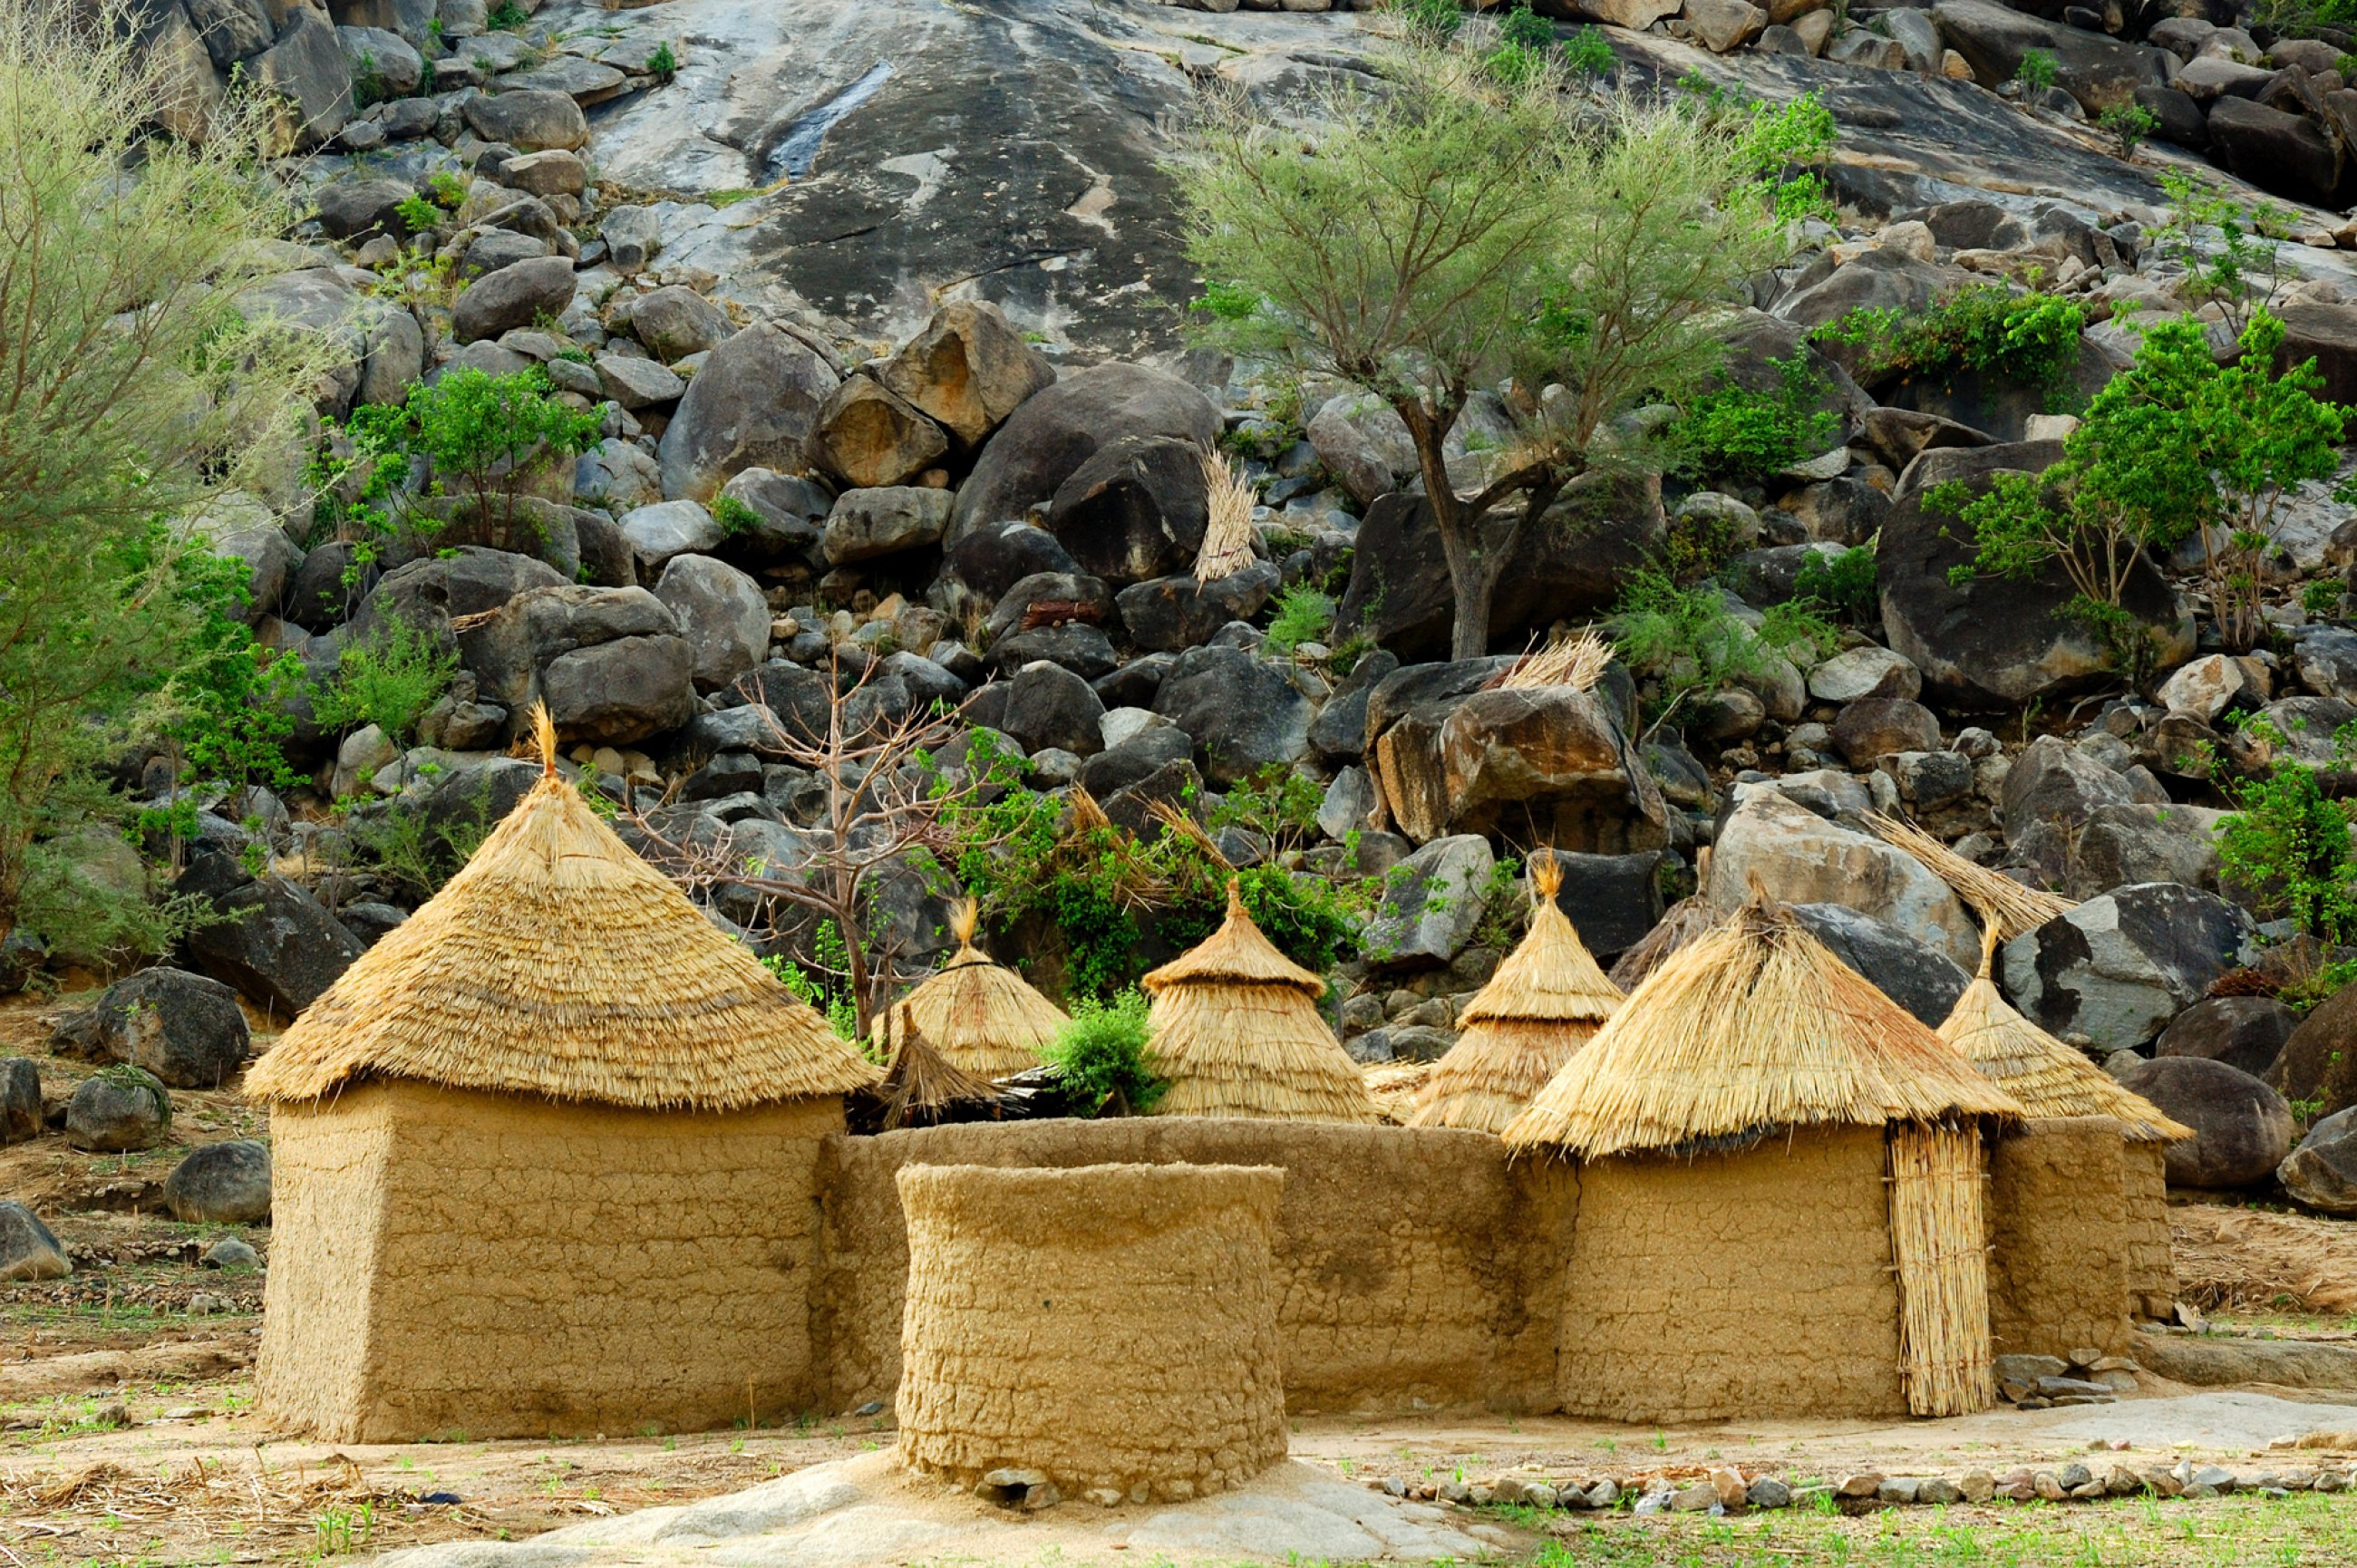 https://bubo.sk/uploads/galleries/7346/kamerun-mud-house-in-the-mandara-mountains-region-of-cameroon-west-africa.jpg